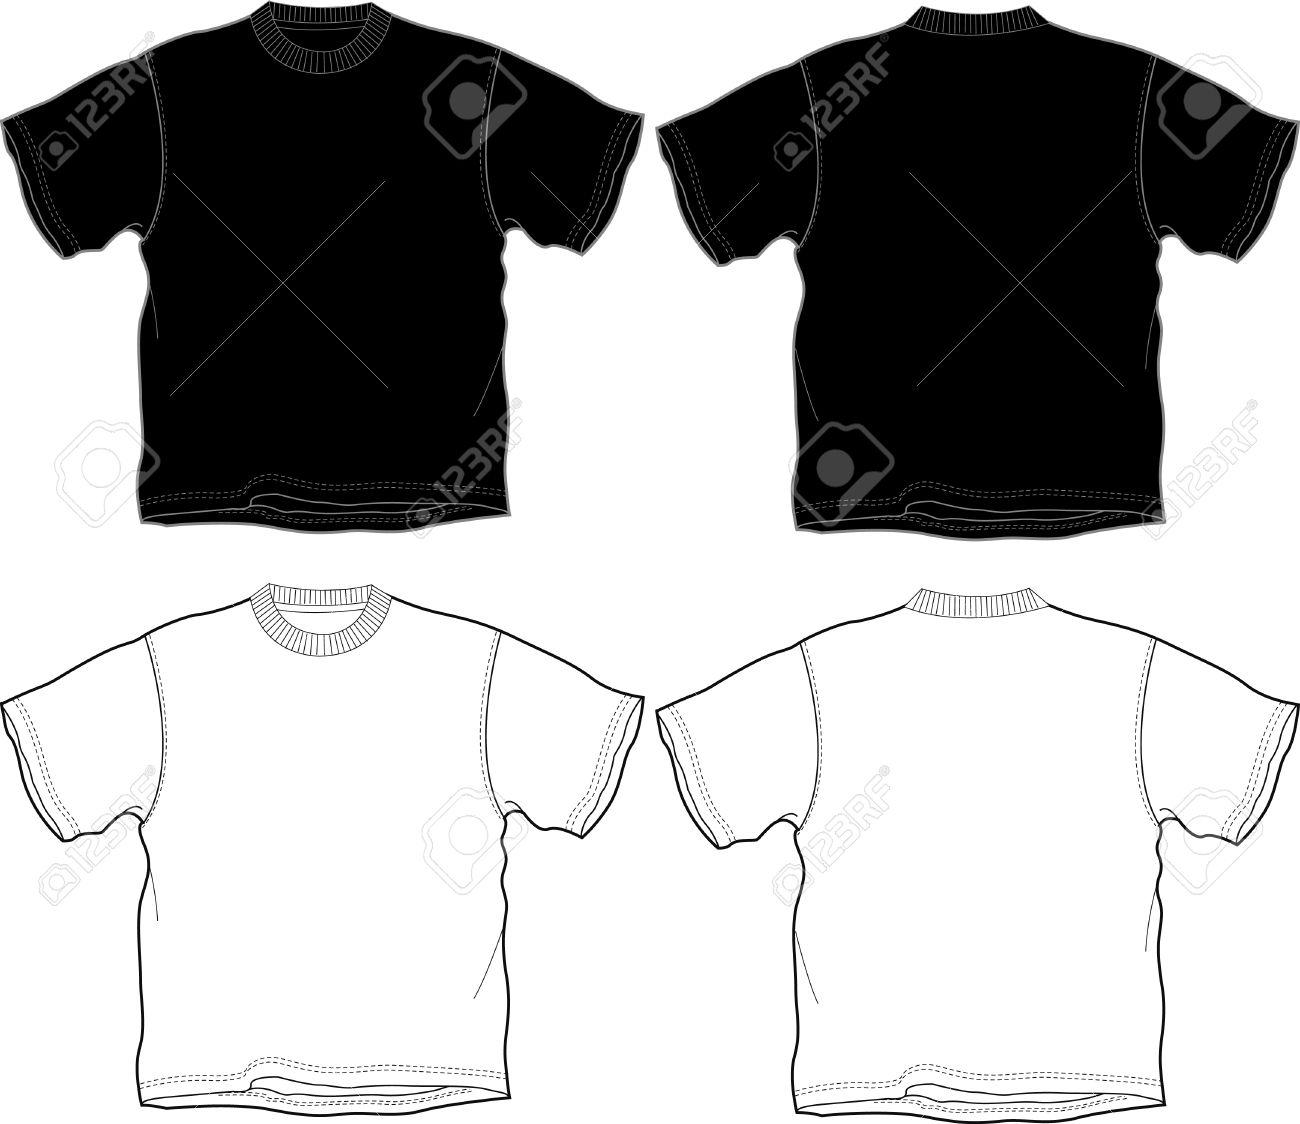 Black t shirt vector - Black T Shirt Outline T Shirt Outline Stock Vector 4381305 Download